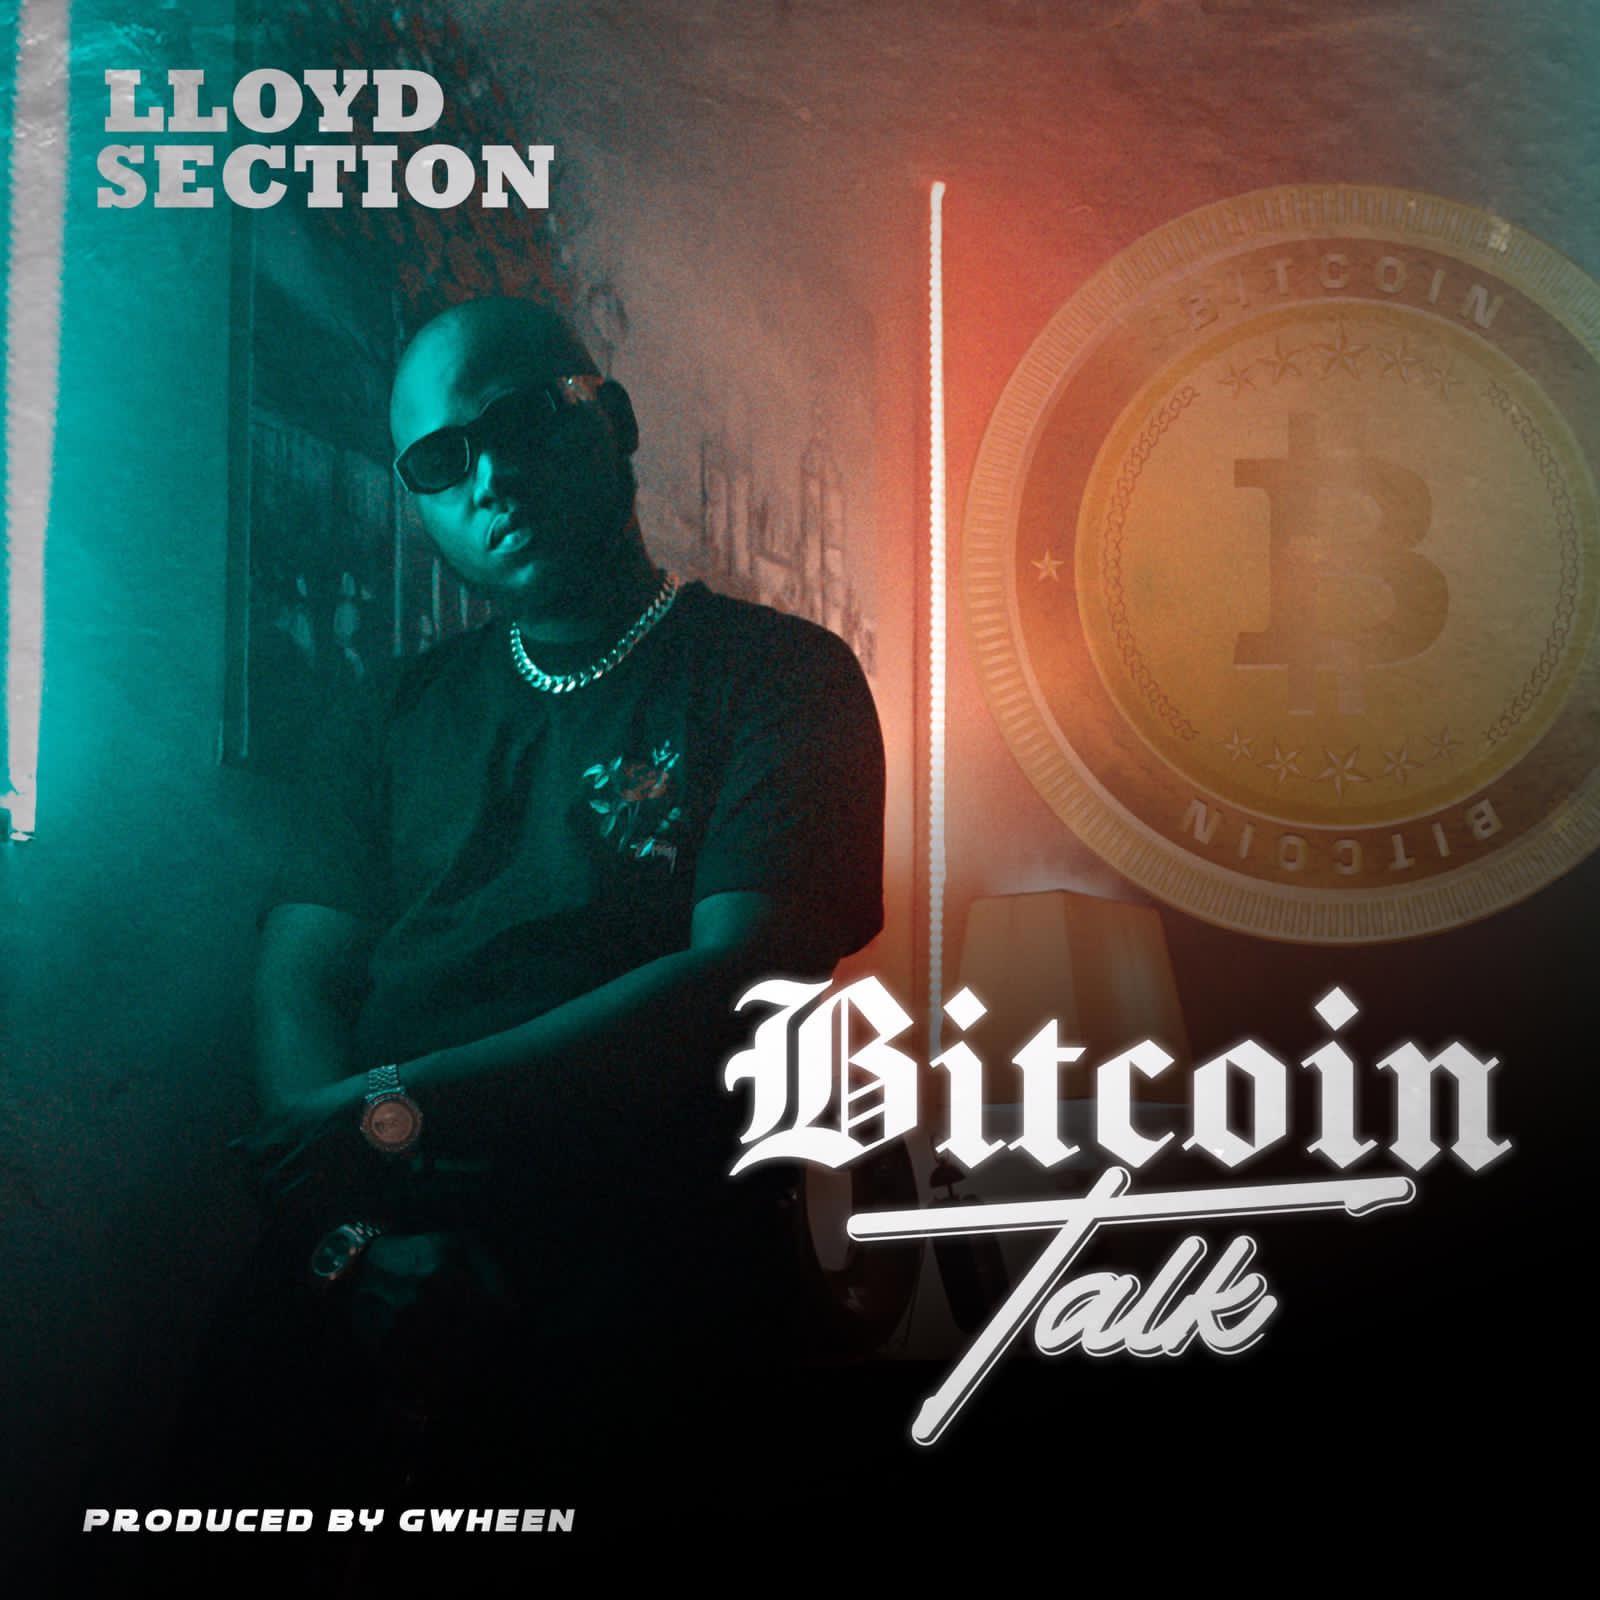 VIDEO & AUDIO: Lloyd section – Bitcoin Talk